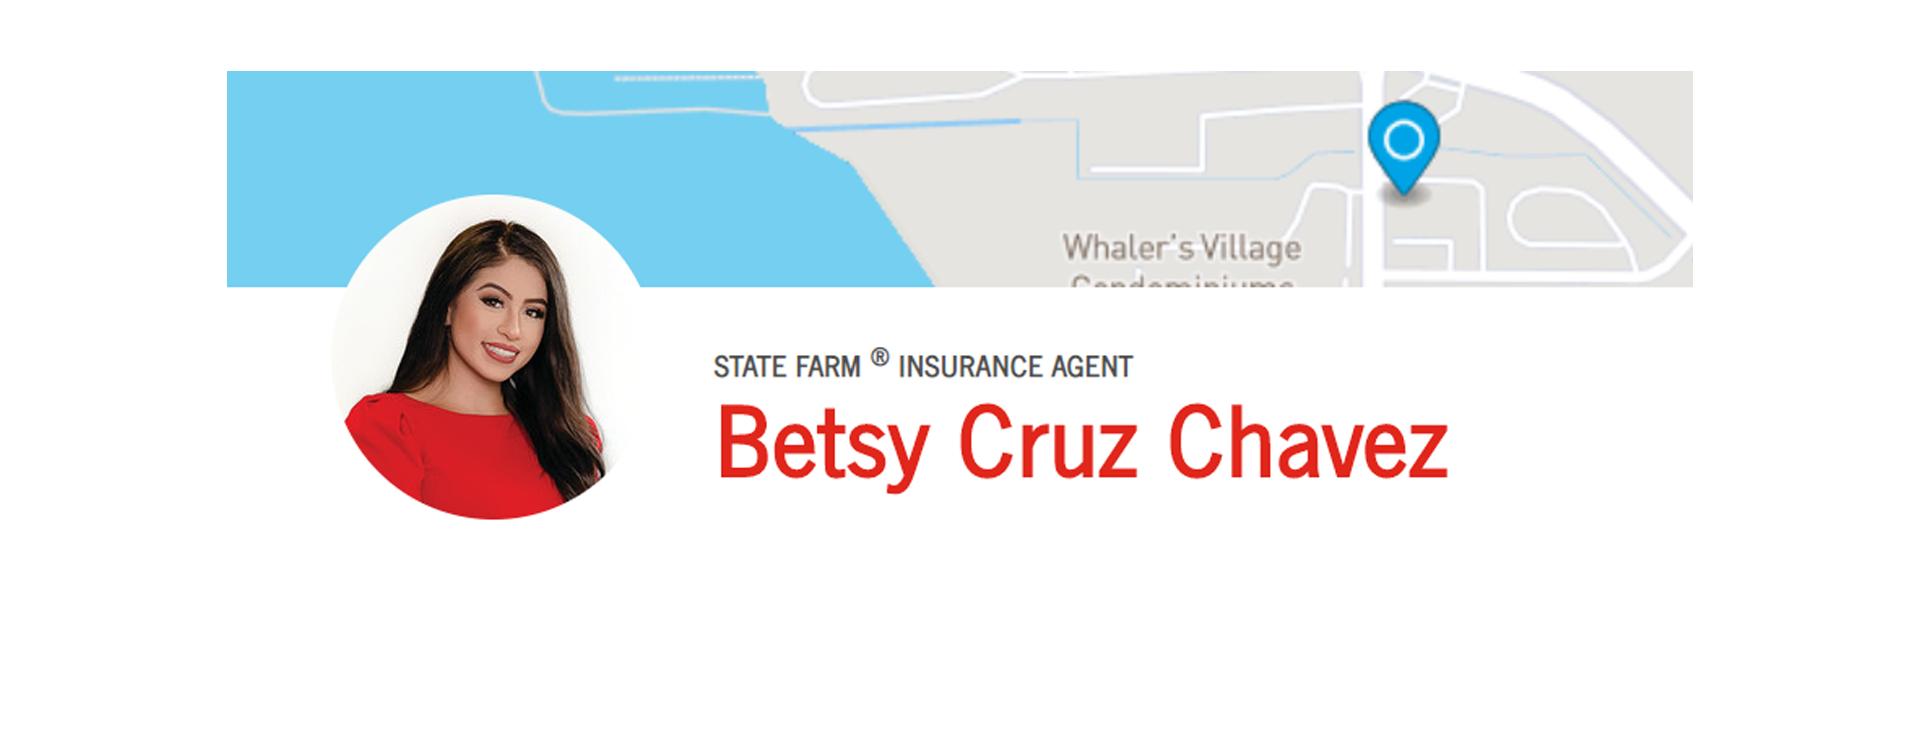 Betsy Cruz Chavez State Farm Insurance Agency